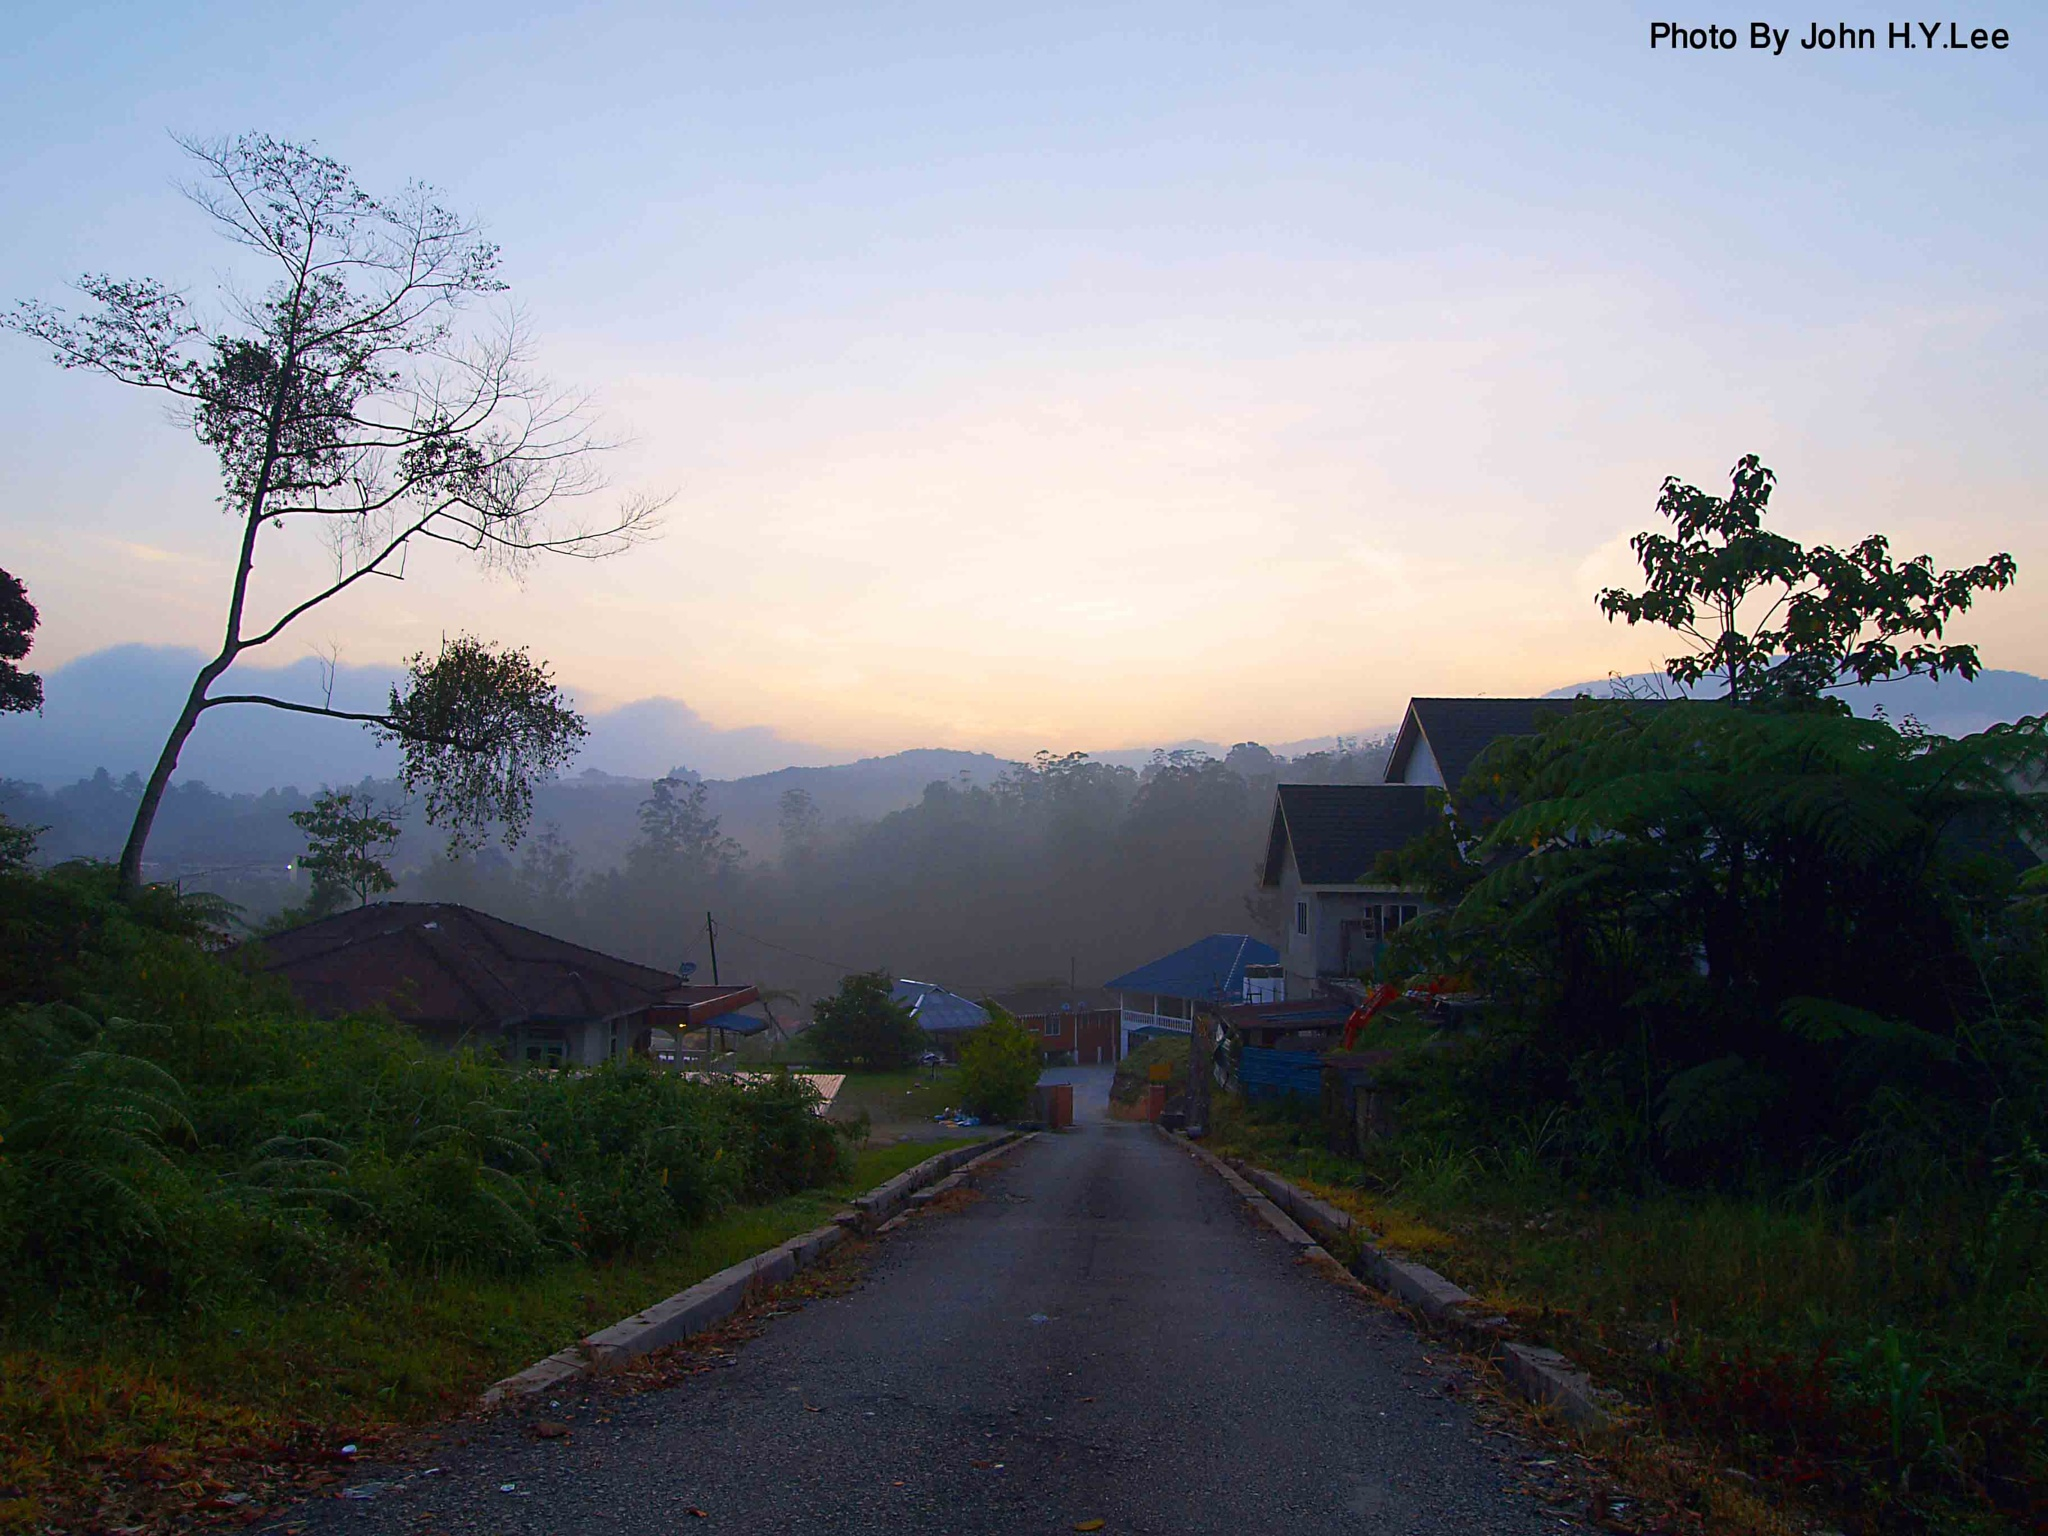 Peaceful Morning by John H.Y.Lee